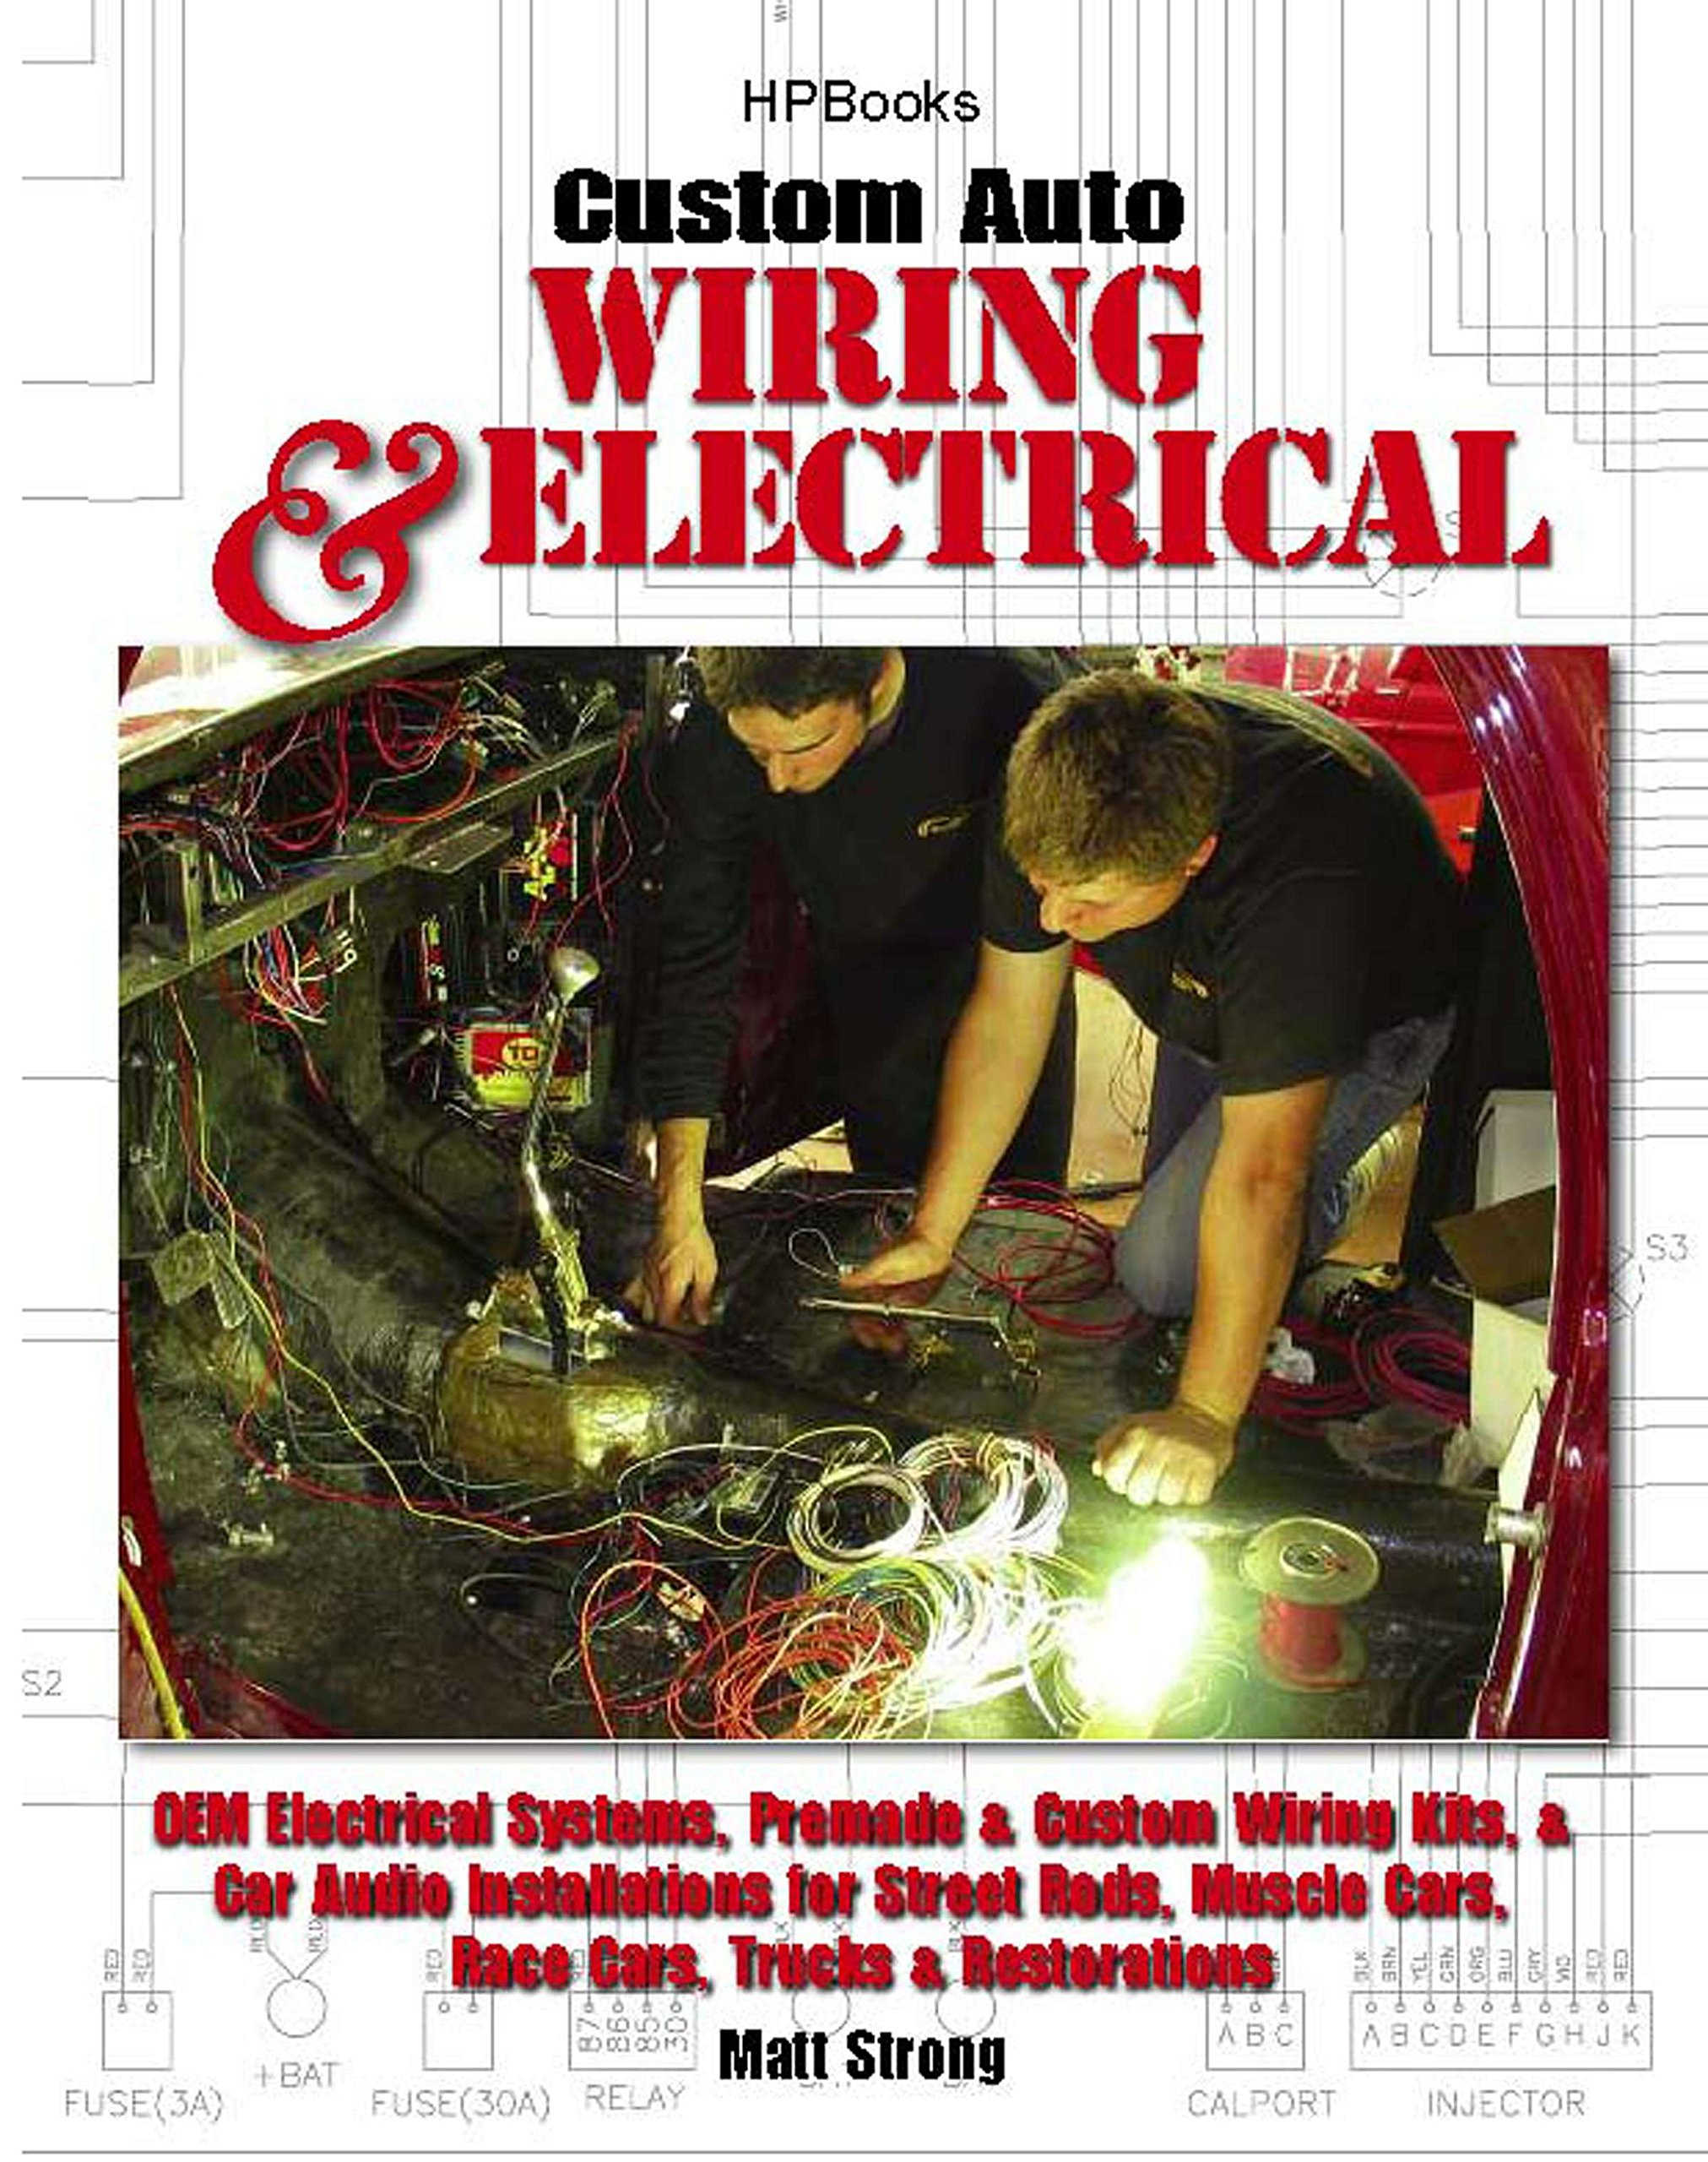 Custom Auto Wiring Electrical Matt Strong Book Amazon 9781557885456 Books